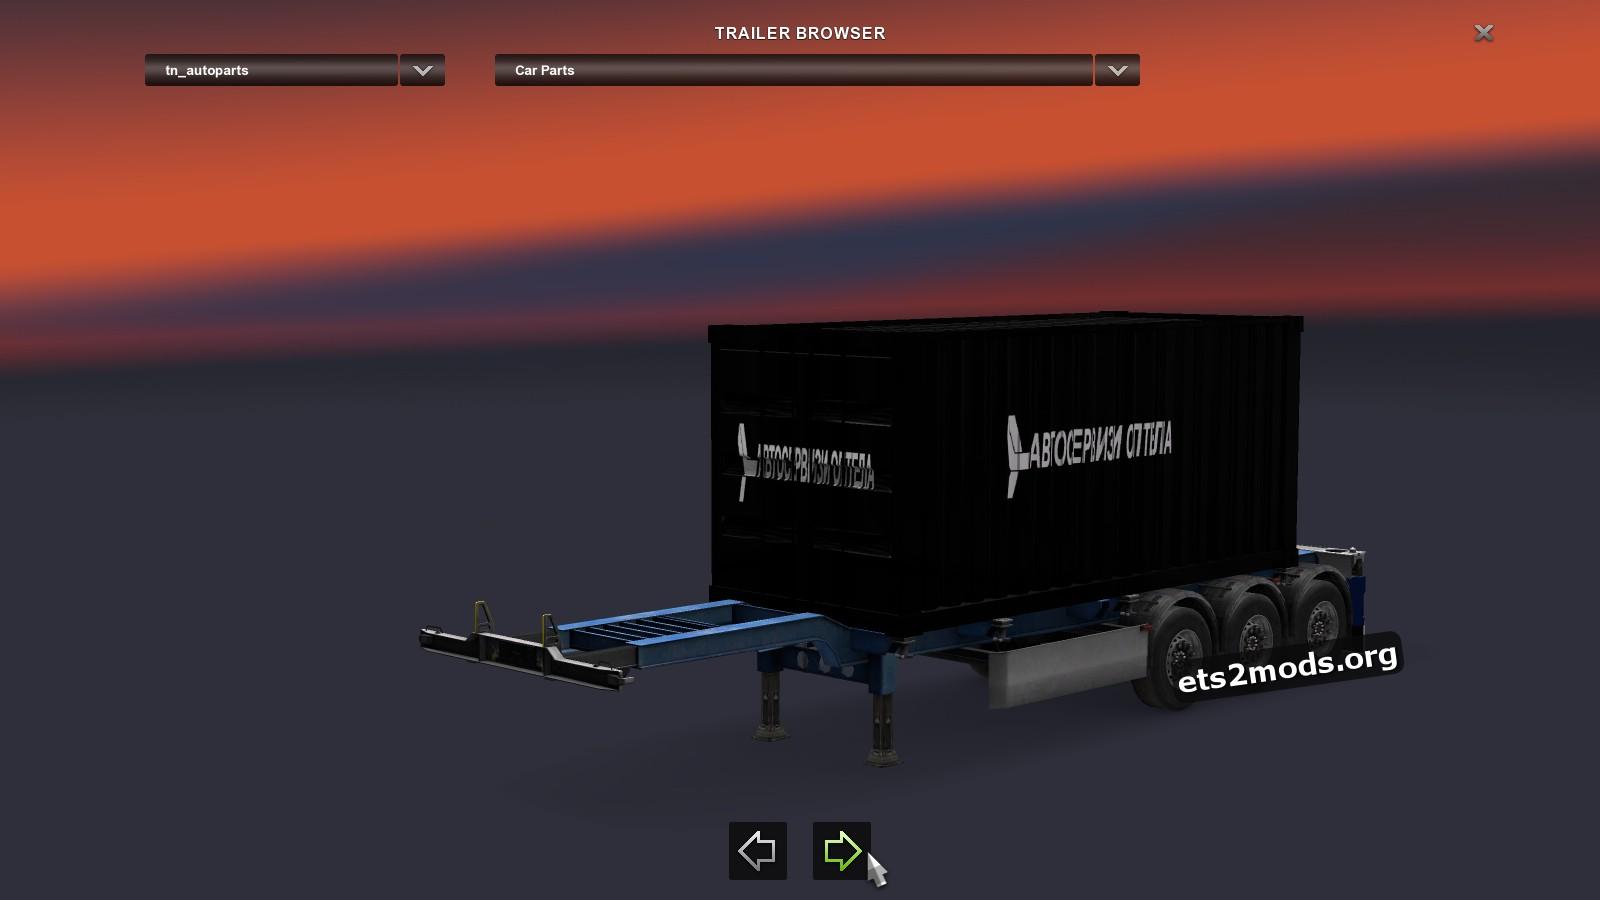 Trailer - Car Parts